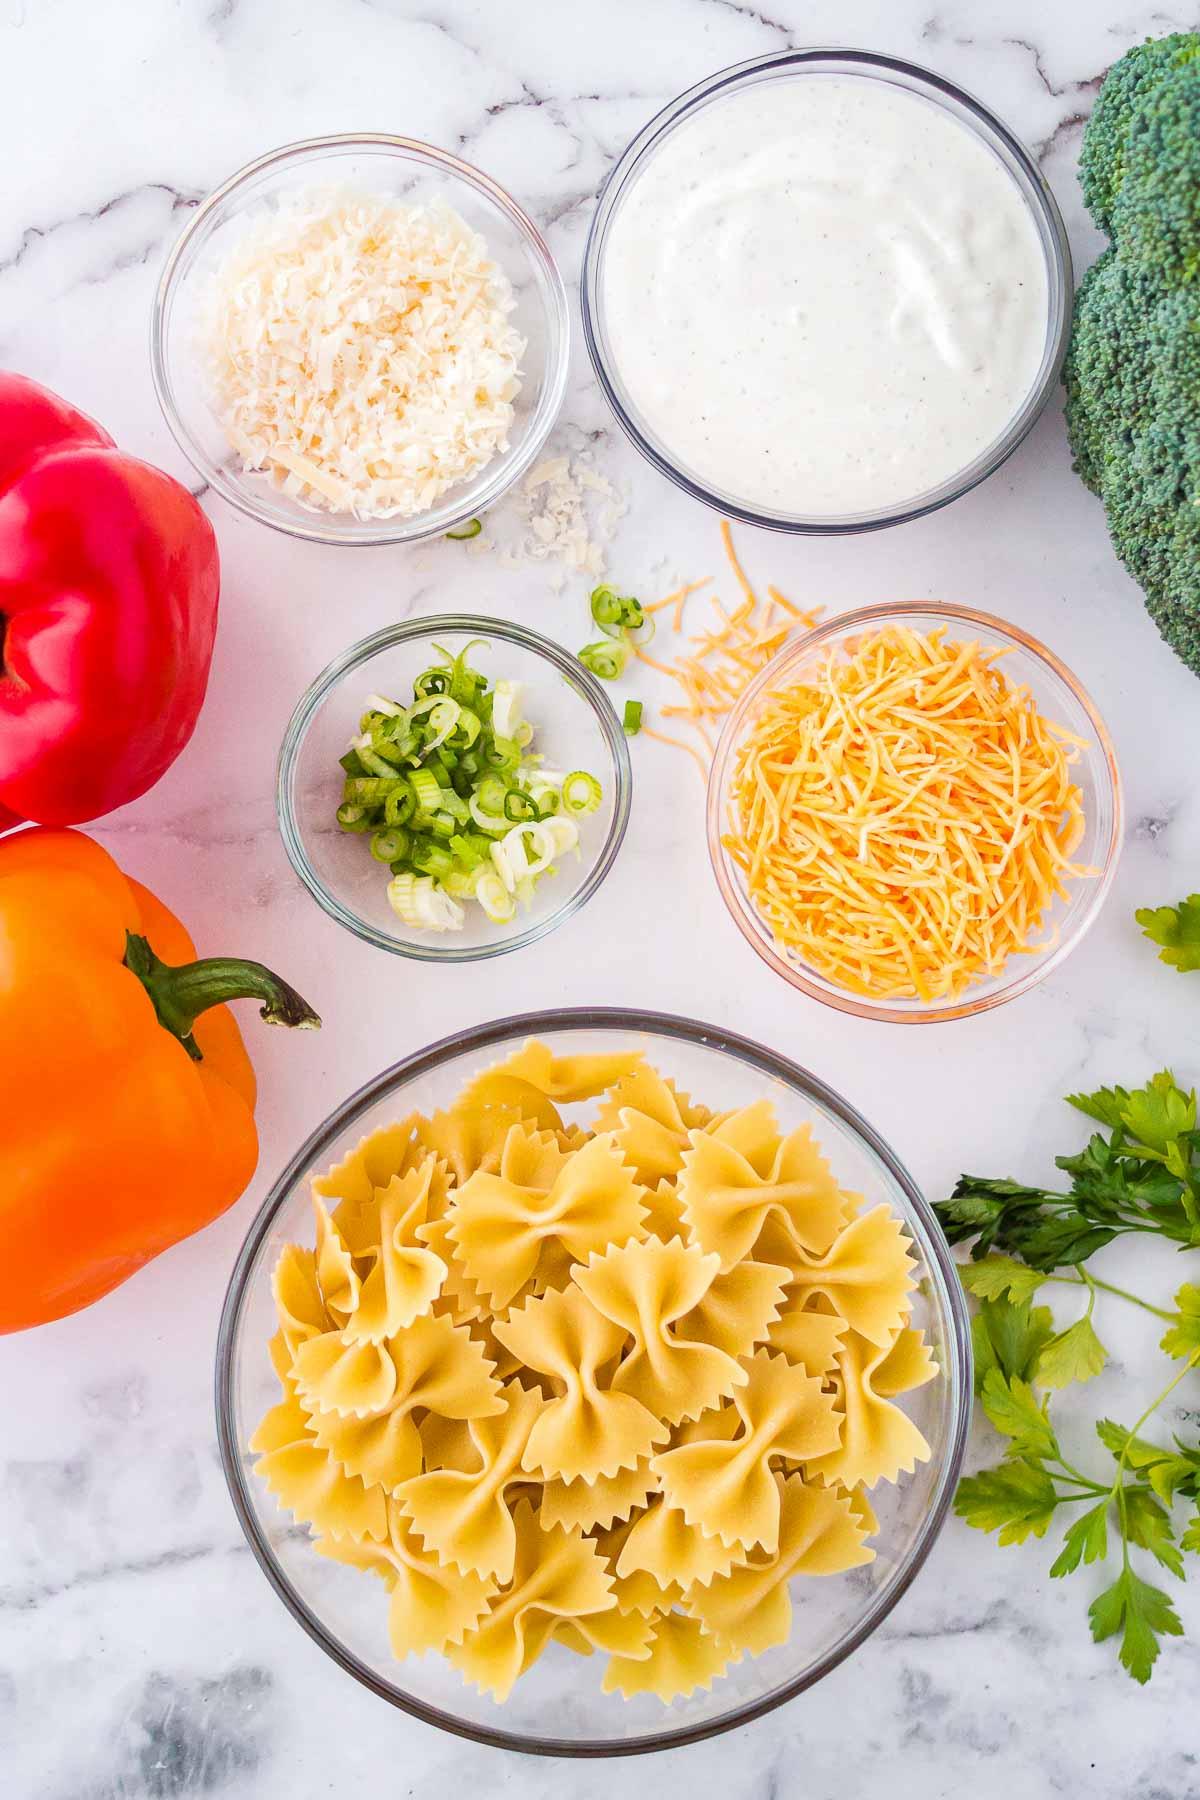 Ingredients for broccoli ranch pasta salad.